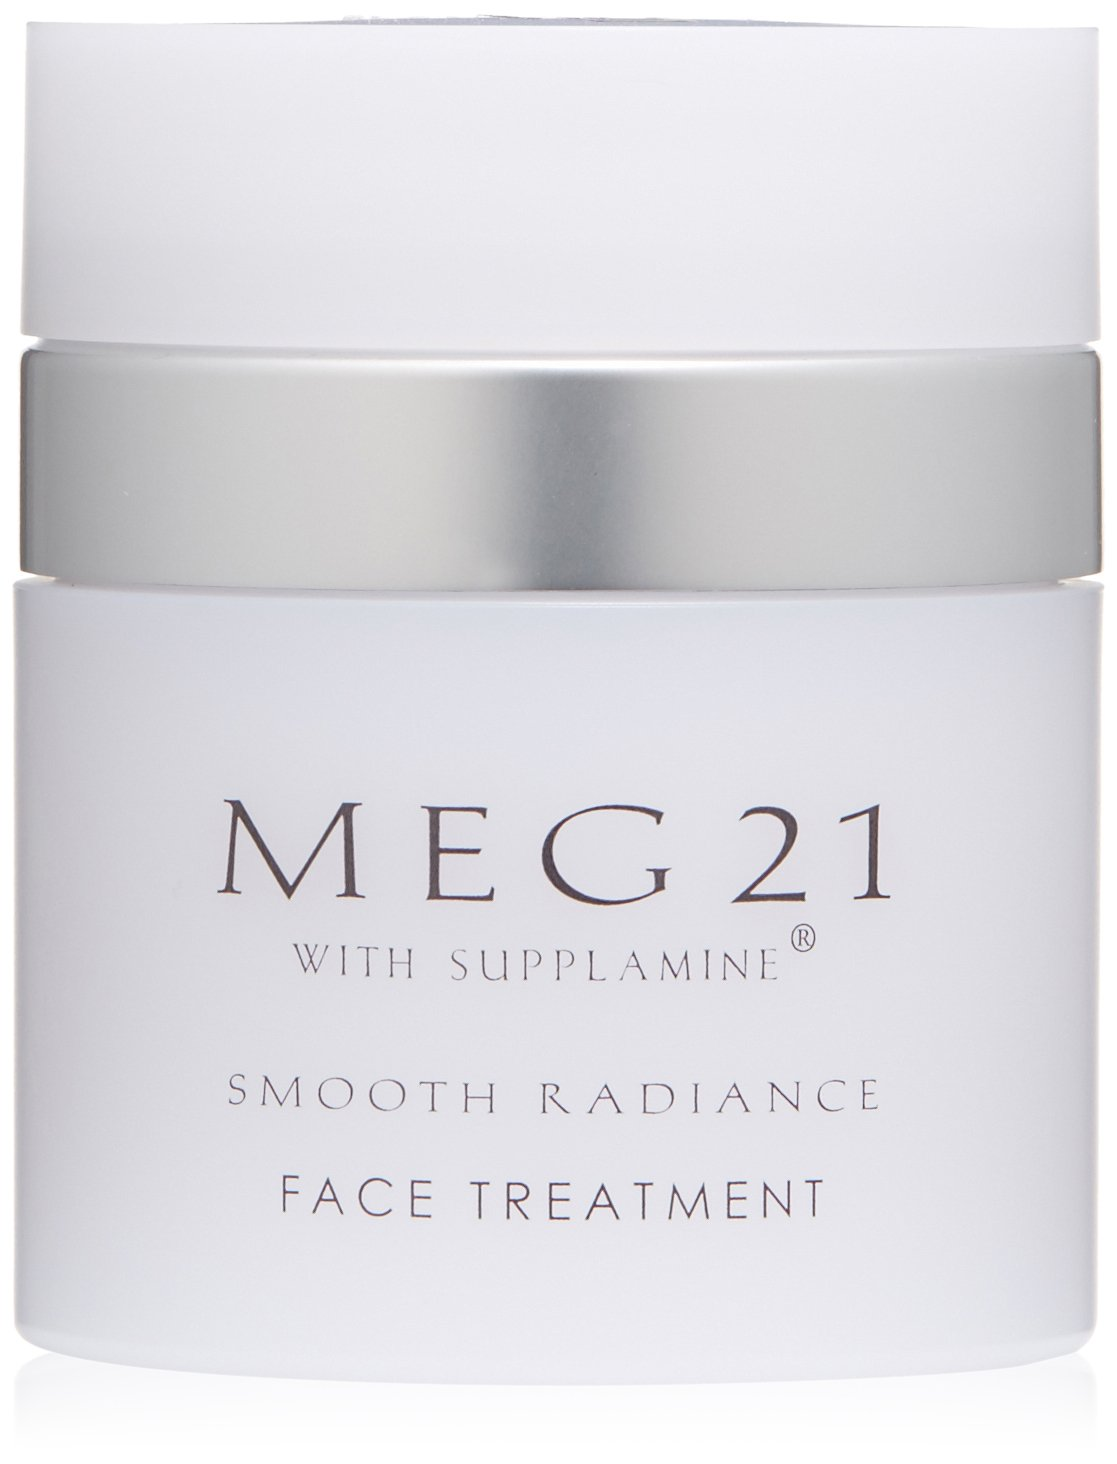 MEG 21 Smooth Radiance Face Treatment, 1.7 oz.